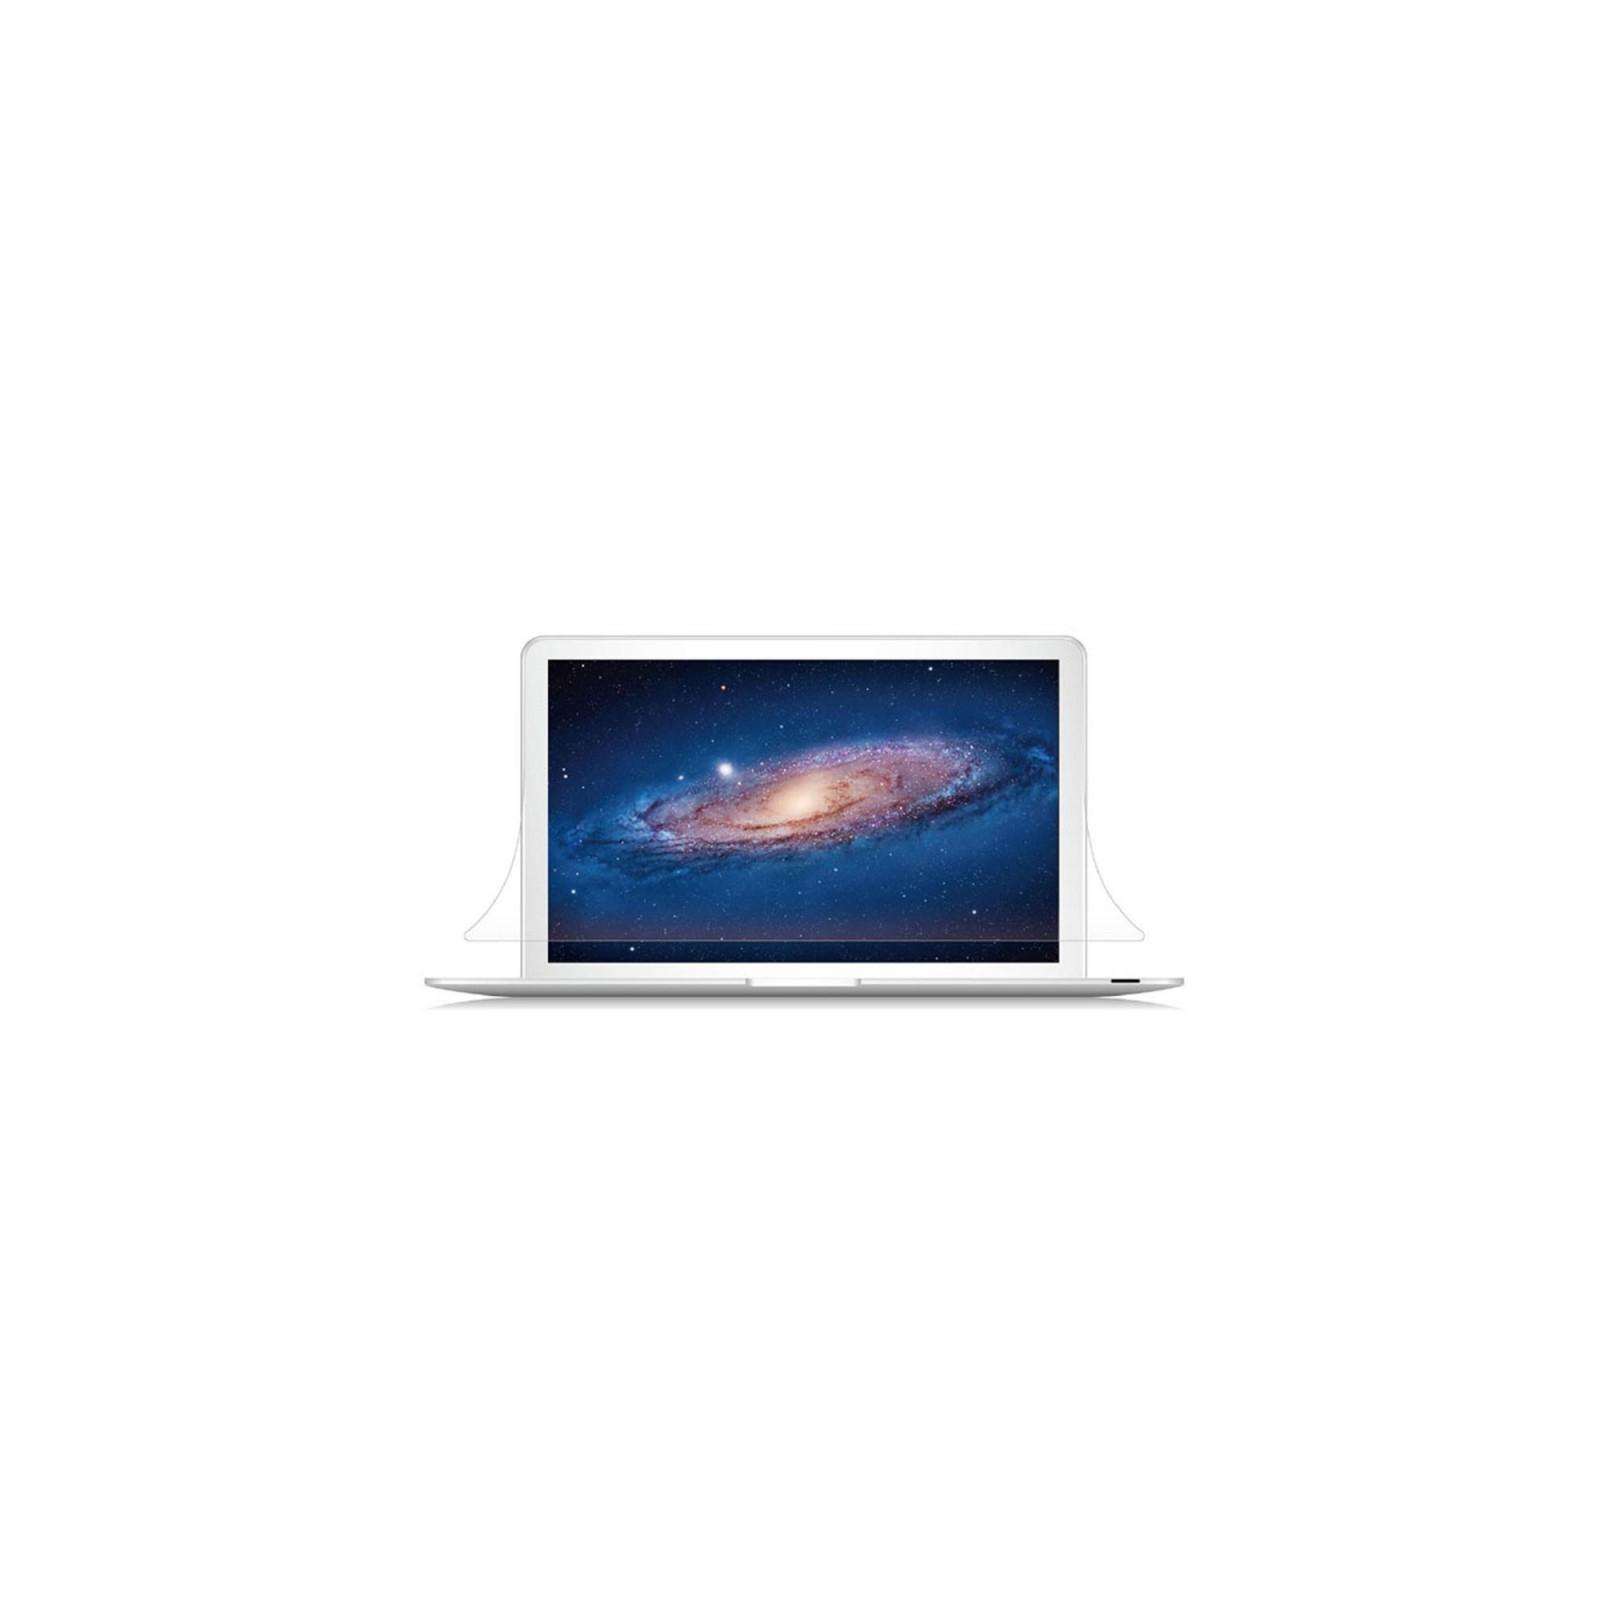 Пленка защитная JCPAL iWoda для MacBook Air 13 (High Transparency) (JCP2010) изображение 3